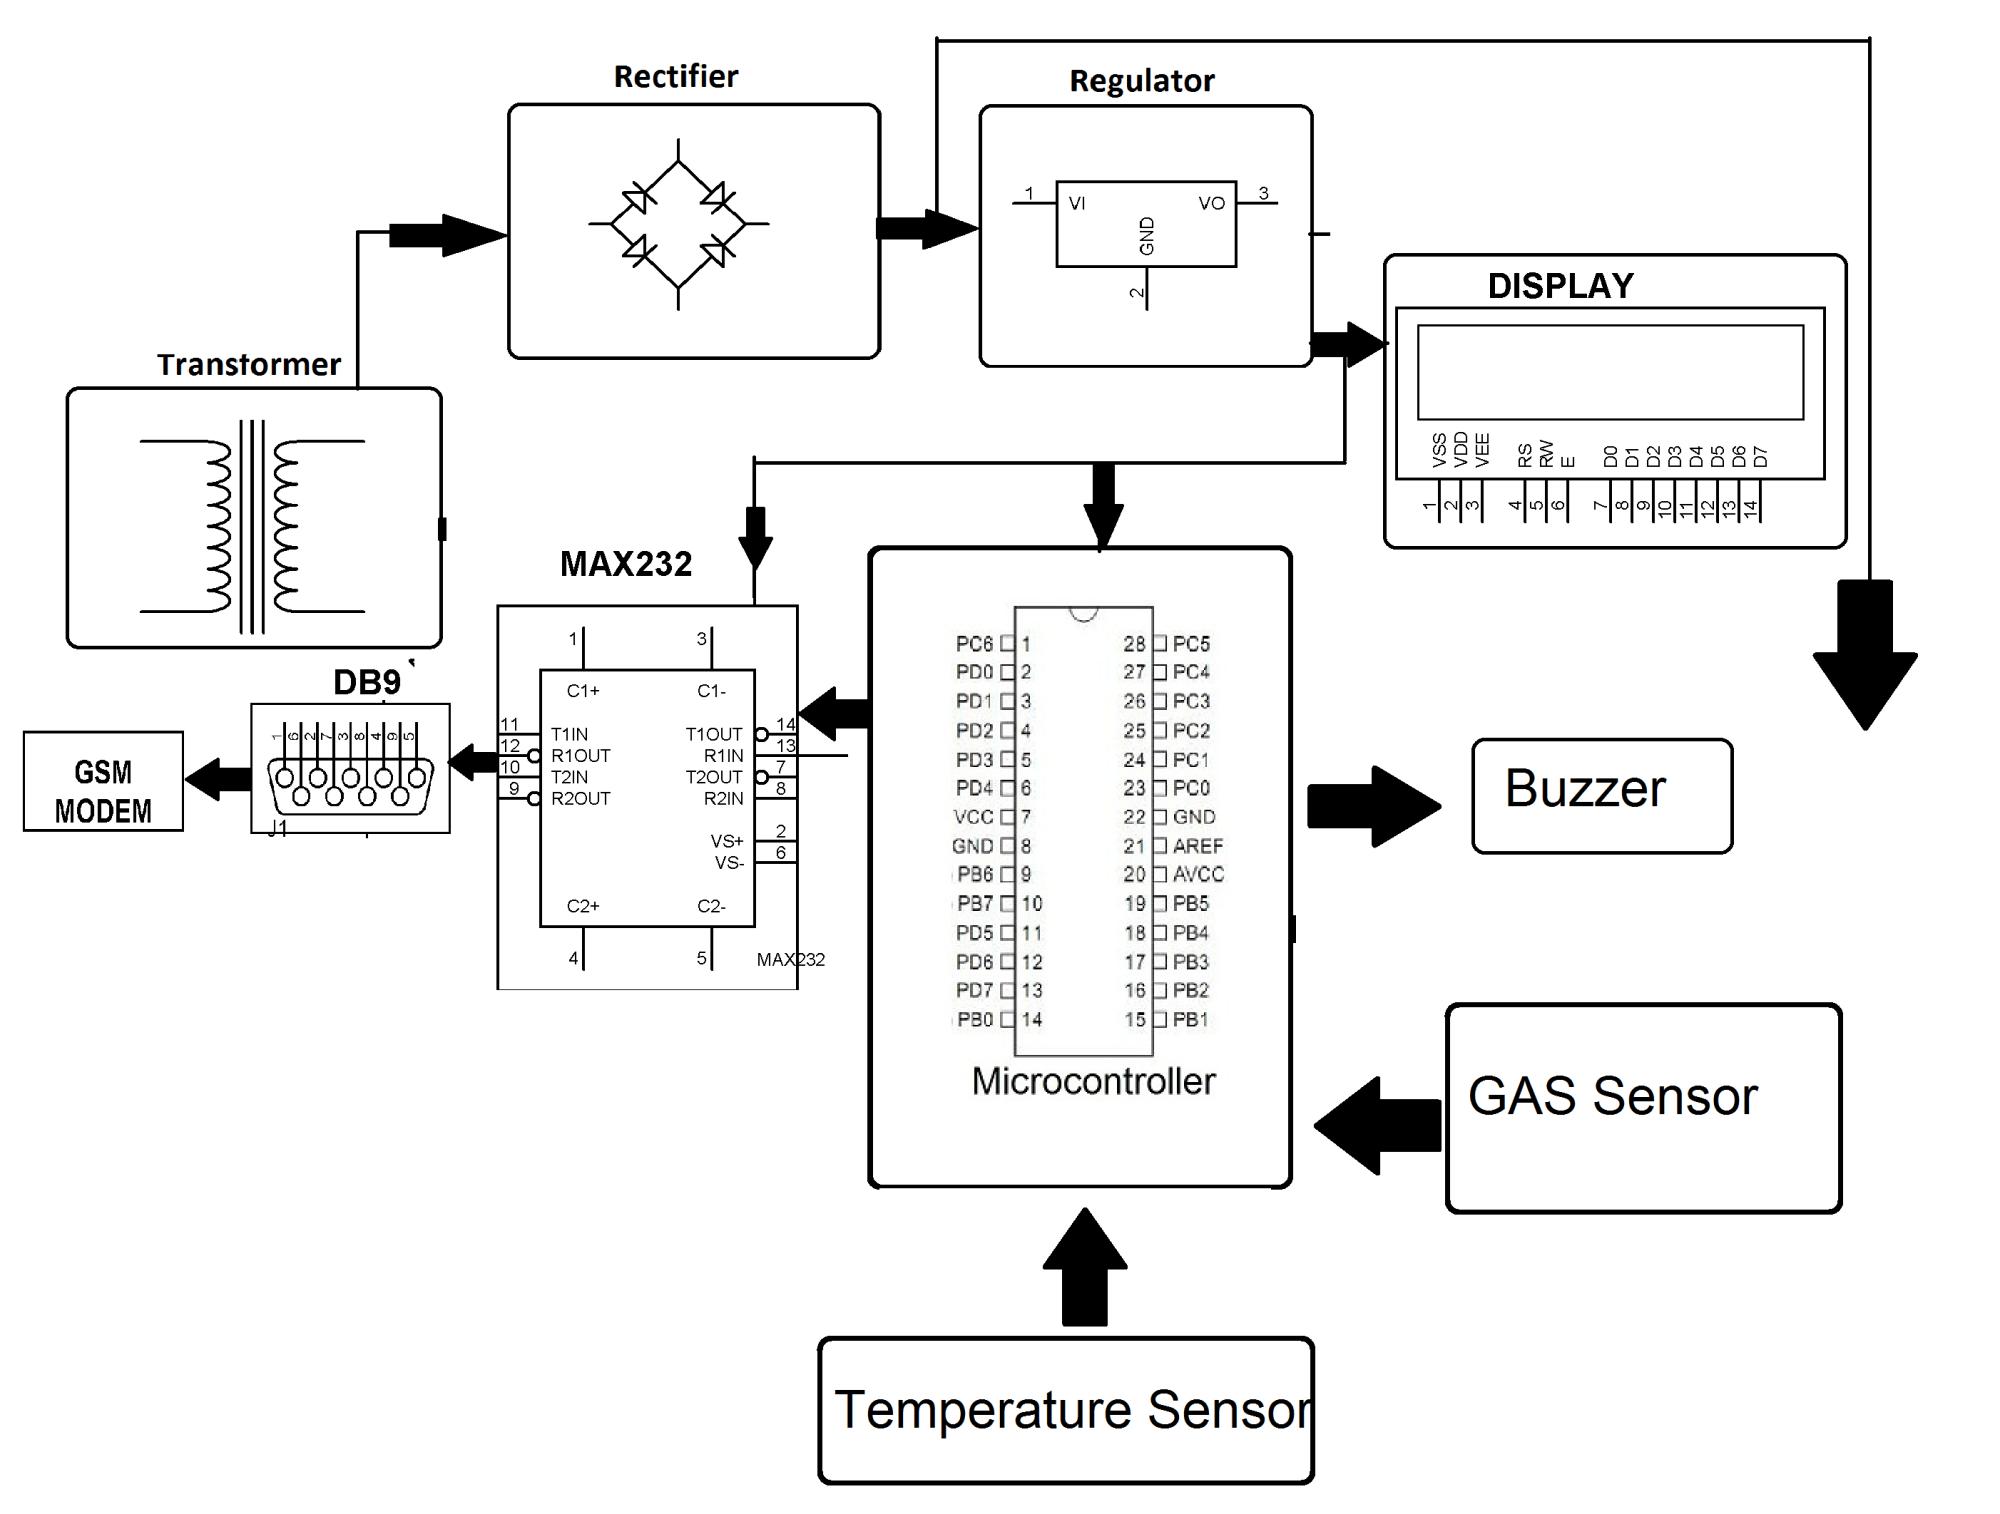 hight resolution of avr microcontroller based fire alarm circuit diagram 12 13 avr microcontroller based fire alarm circuit diagram